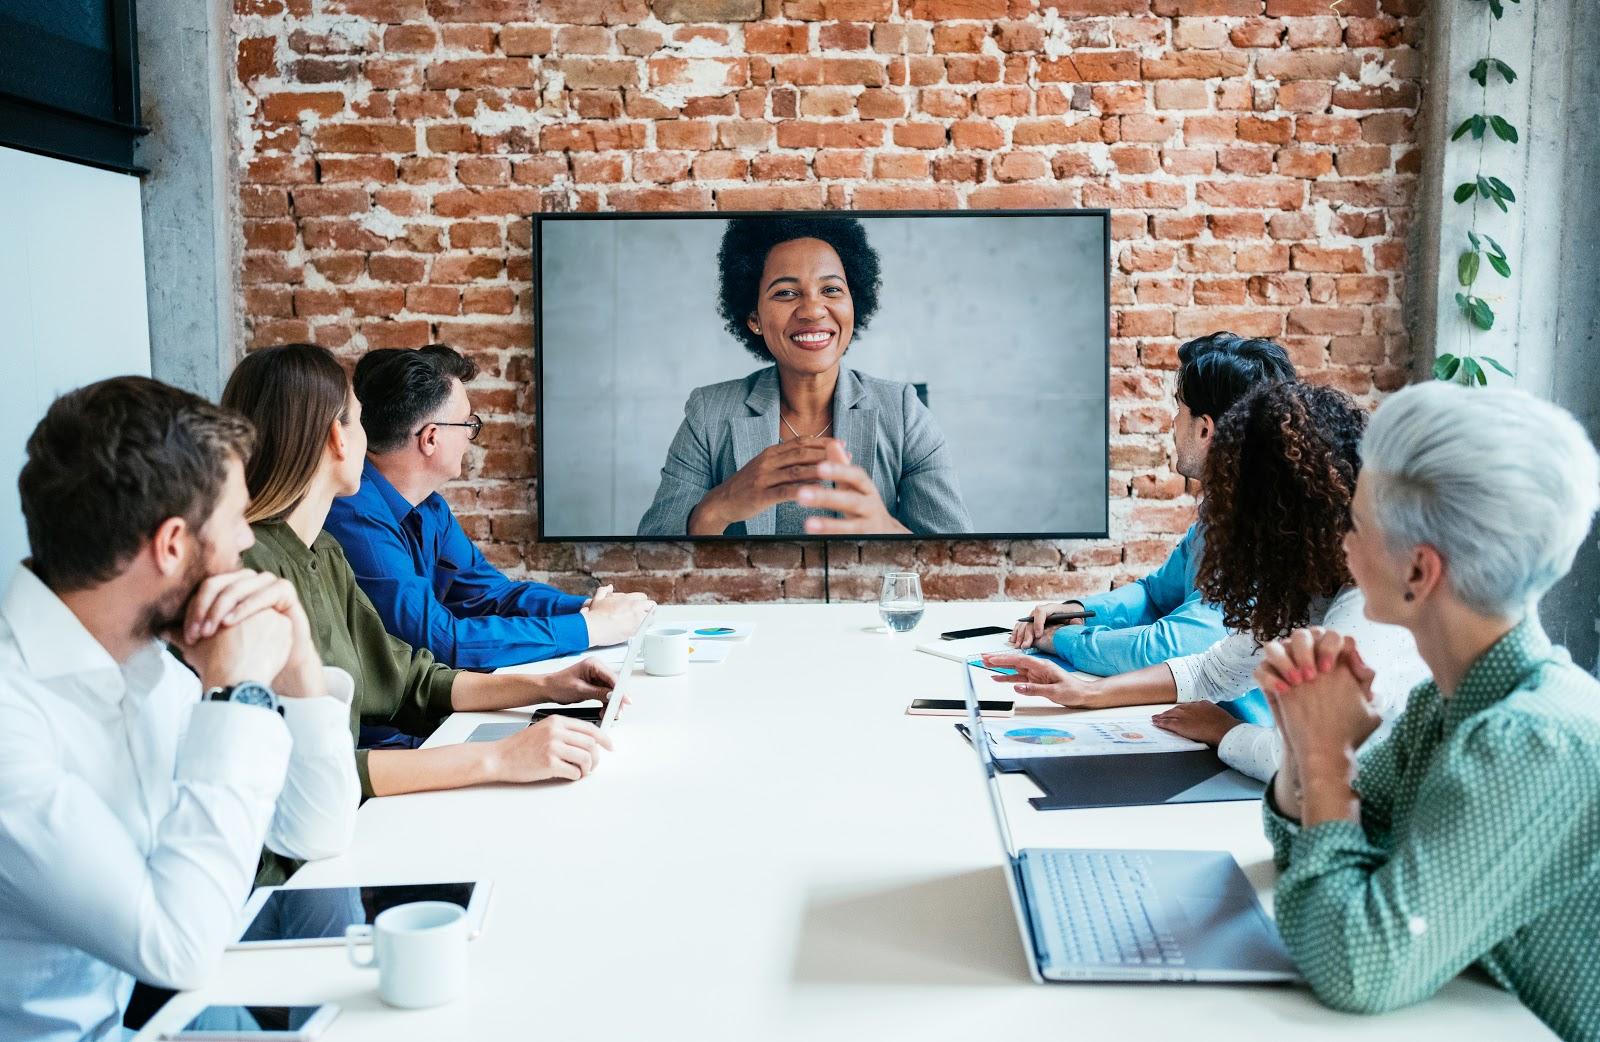 vymeet视频会议积极创新更高效的线上会议模式